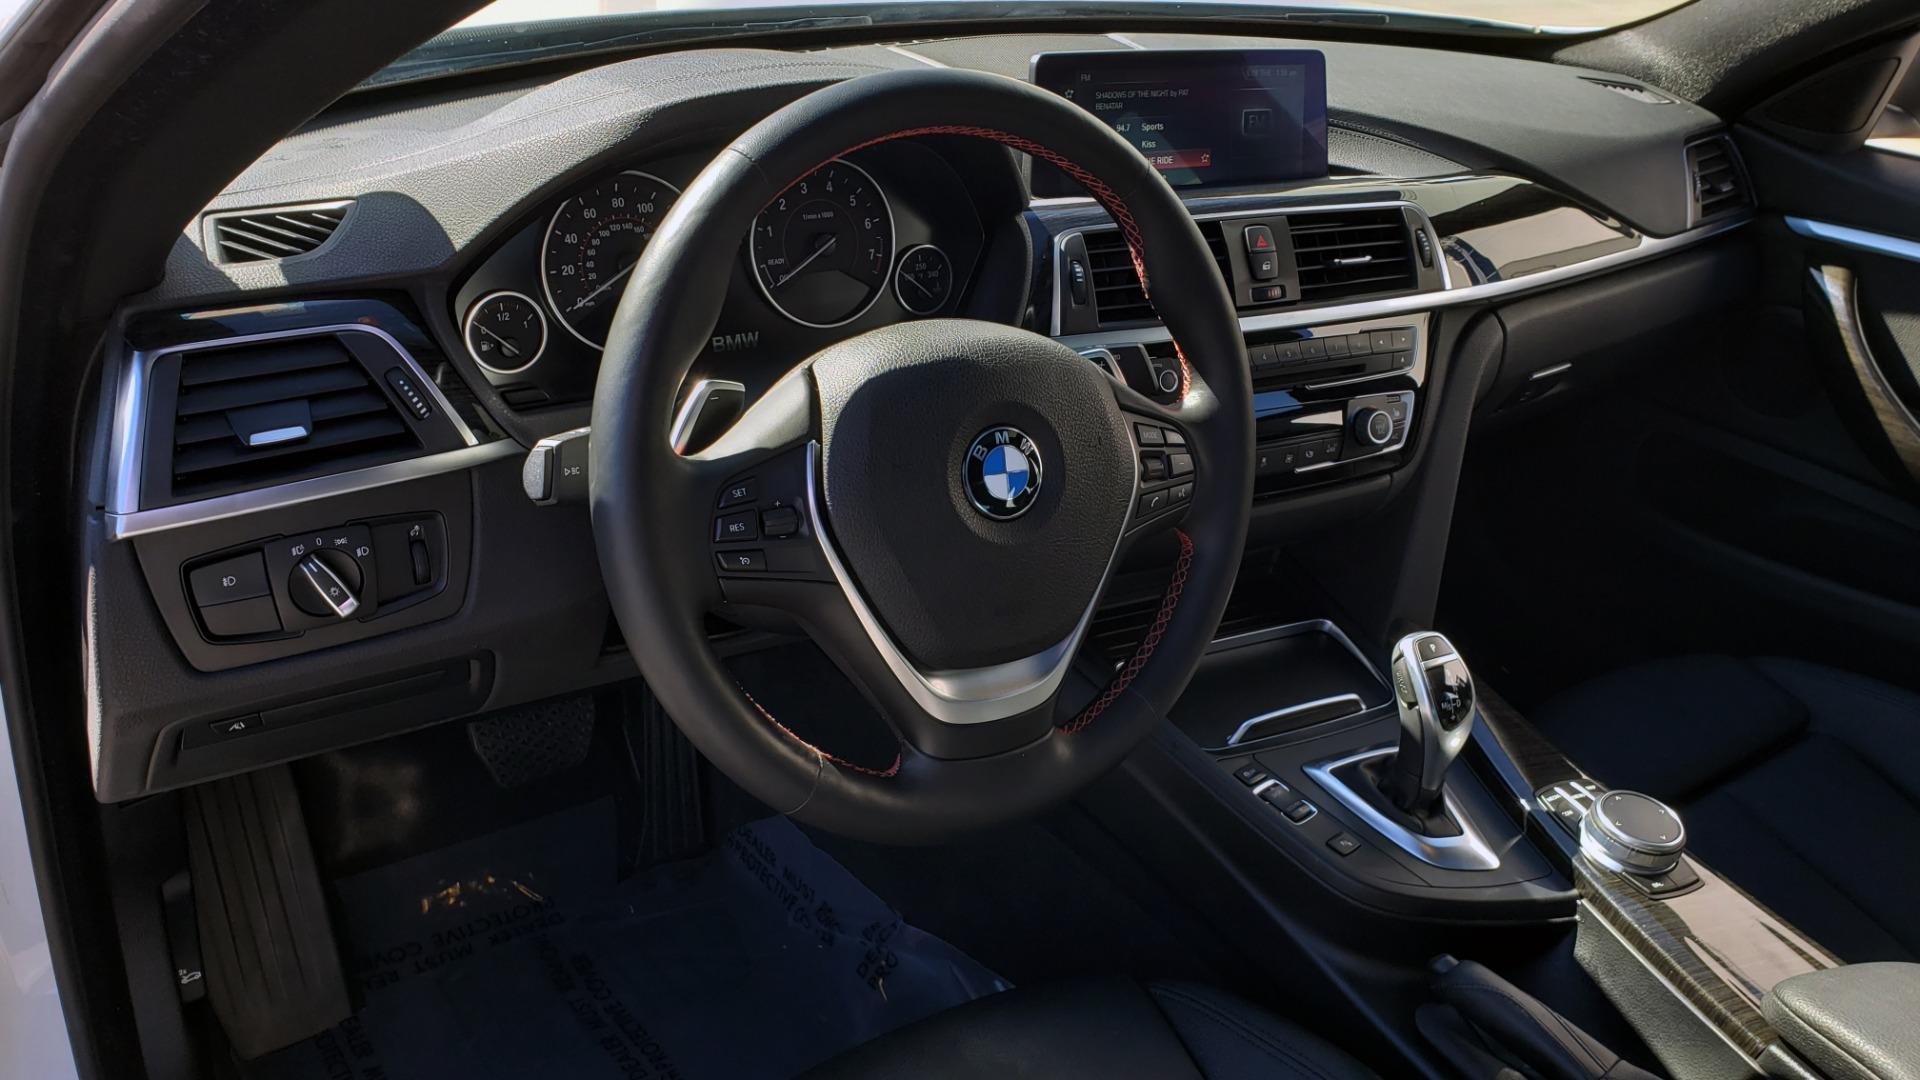 Used 2018 BMW 4 SERIES 430IXDRIVE / PREMIUM / NAV / SUNROOF / ESSENTIALS PKG for sale $28,995 at Formula Imports in Charlotte NC 28227 35